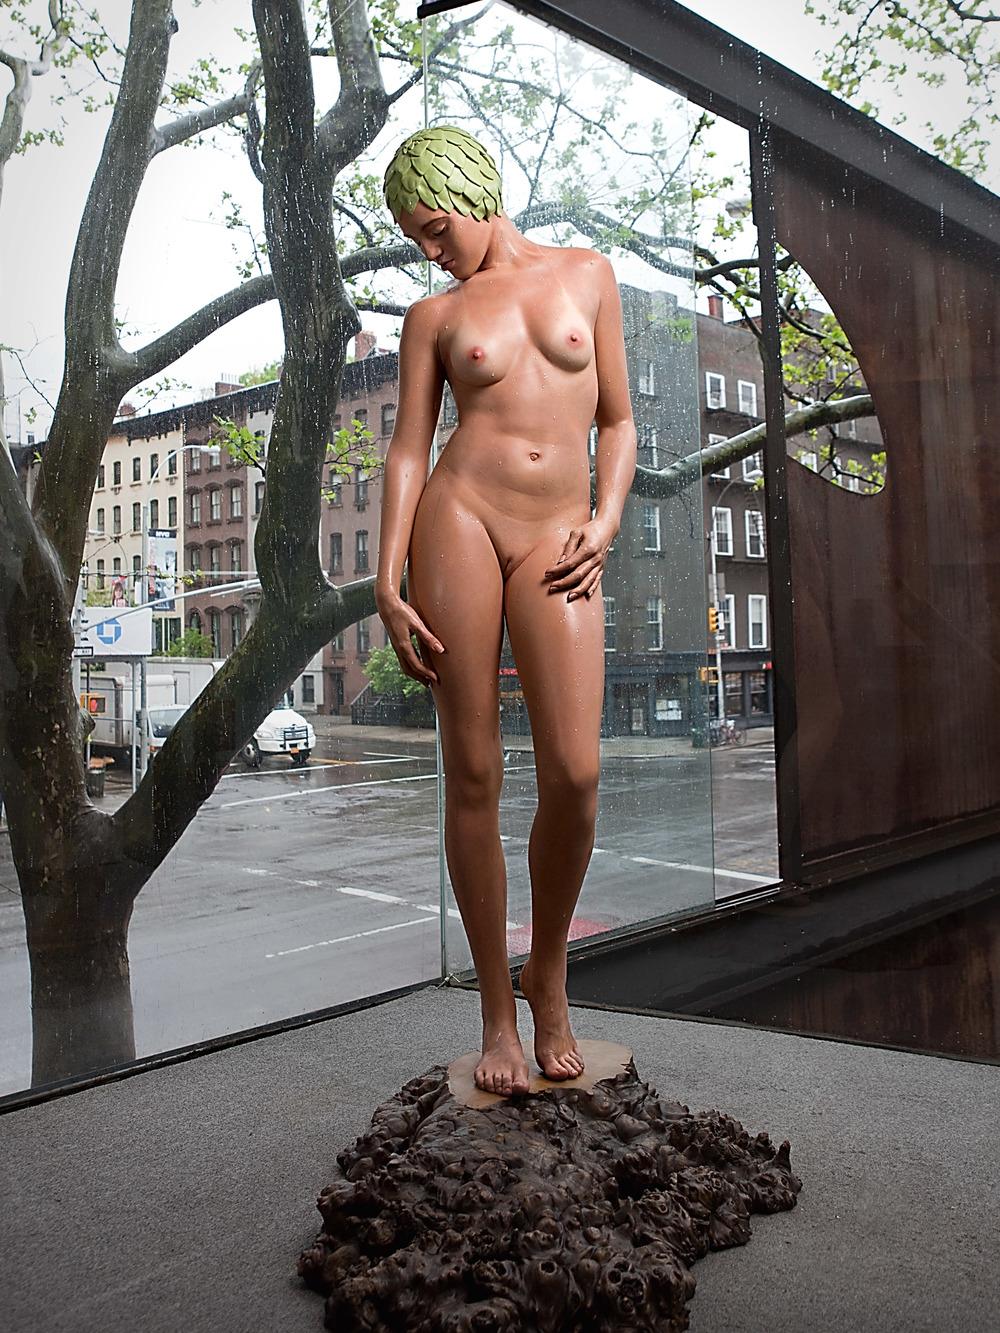 "Tree, Jim Kempner Fine Art, New York, 2013, Oil on Resin, 62"" x 37"" x 29"""